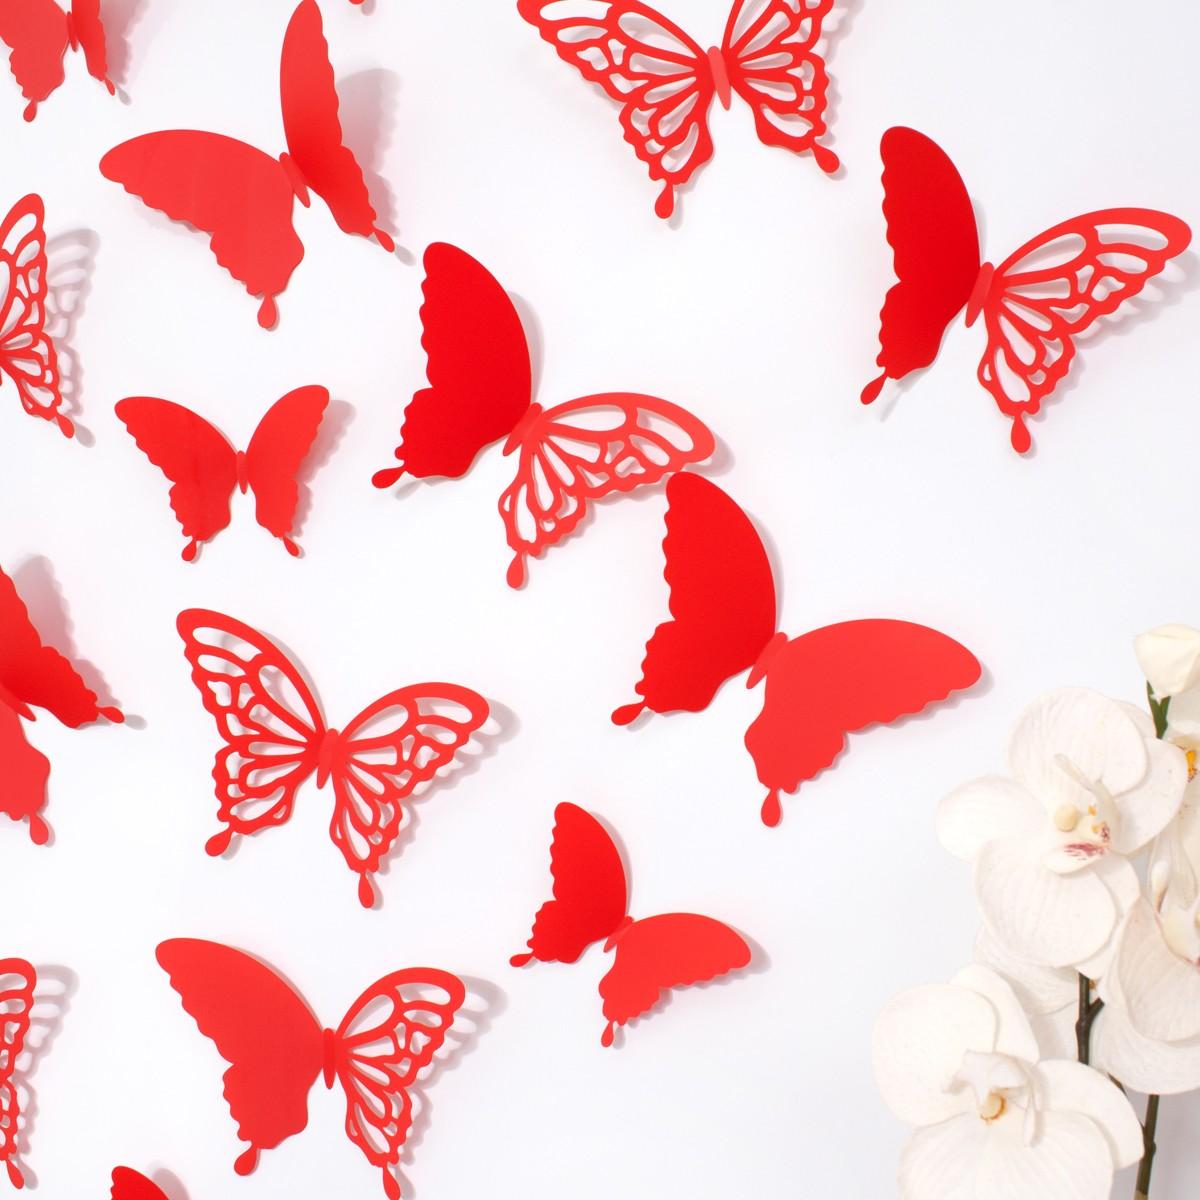 Wandtattoo Rote Blumen : Home Wandtattoo Wandtattoo 3D  Schmetterlinge rot mit Ornamenten